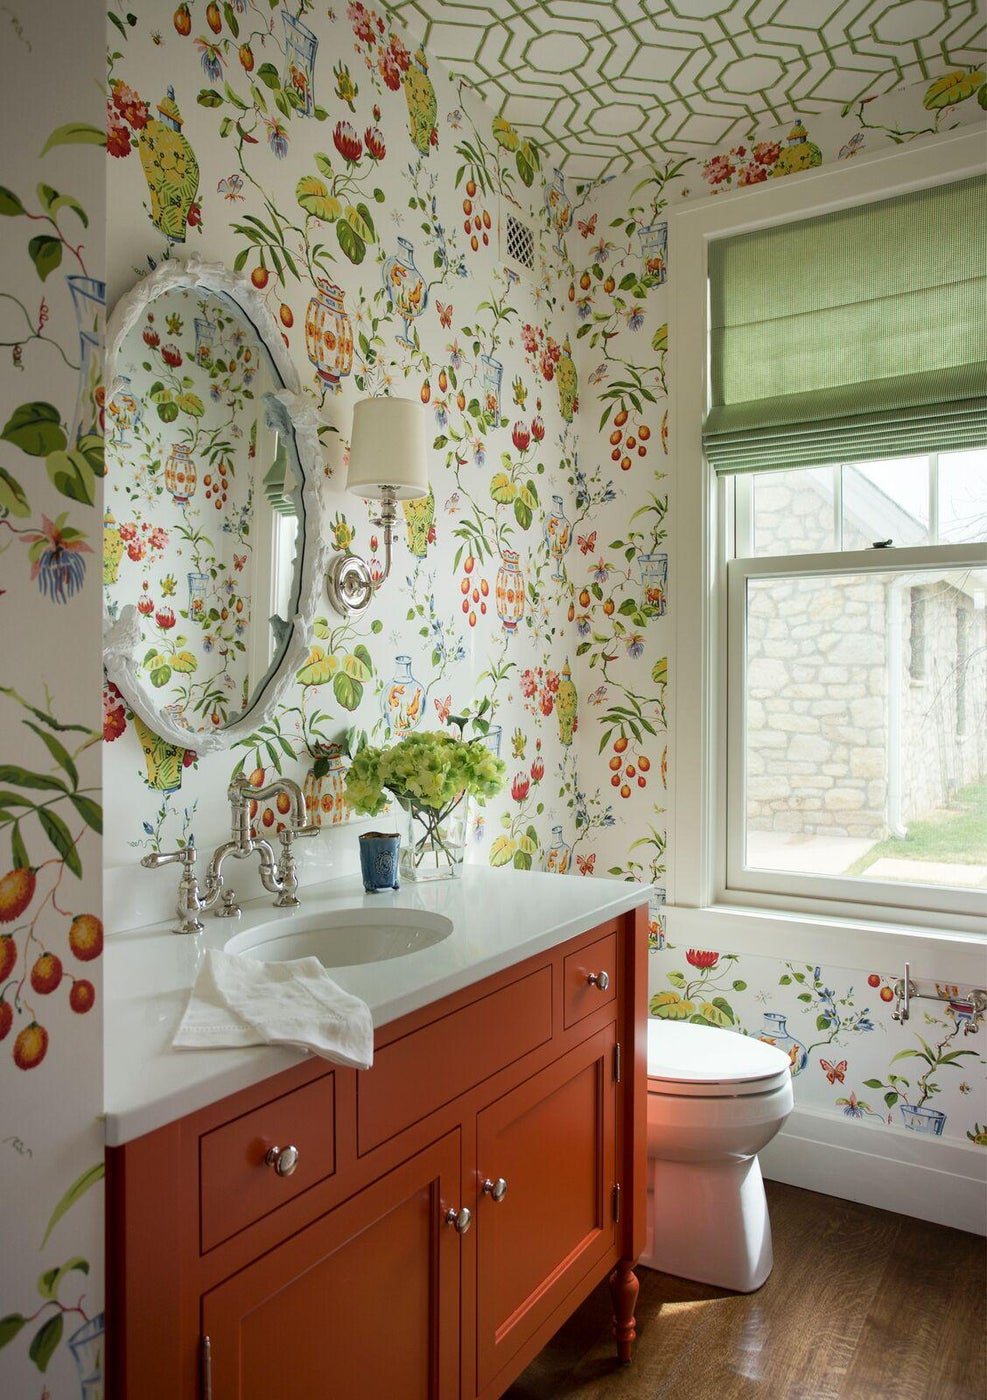 Statement bathroom with floral print wallpaper, burnt orange vanity